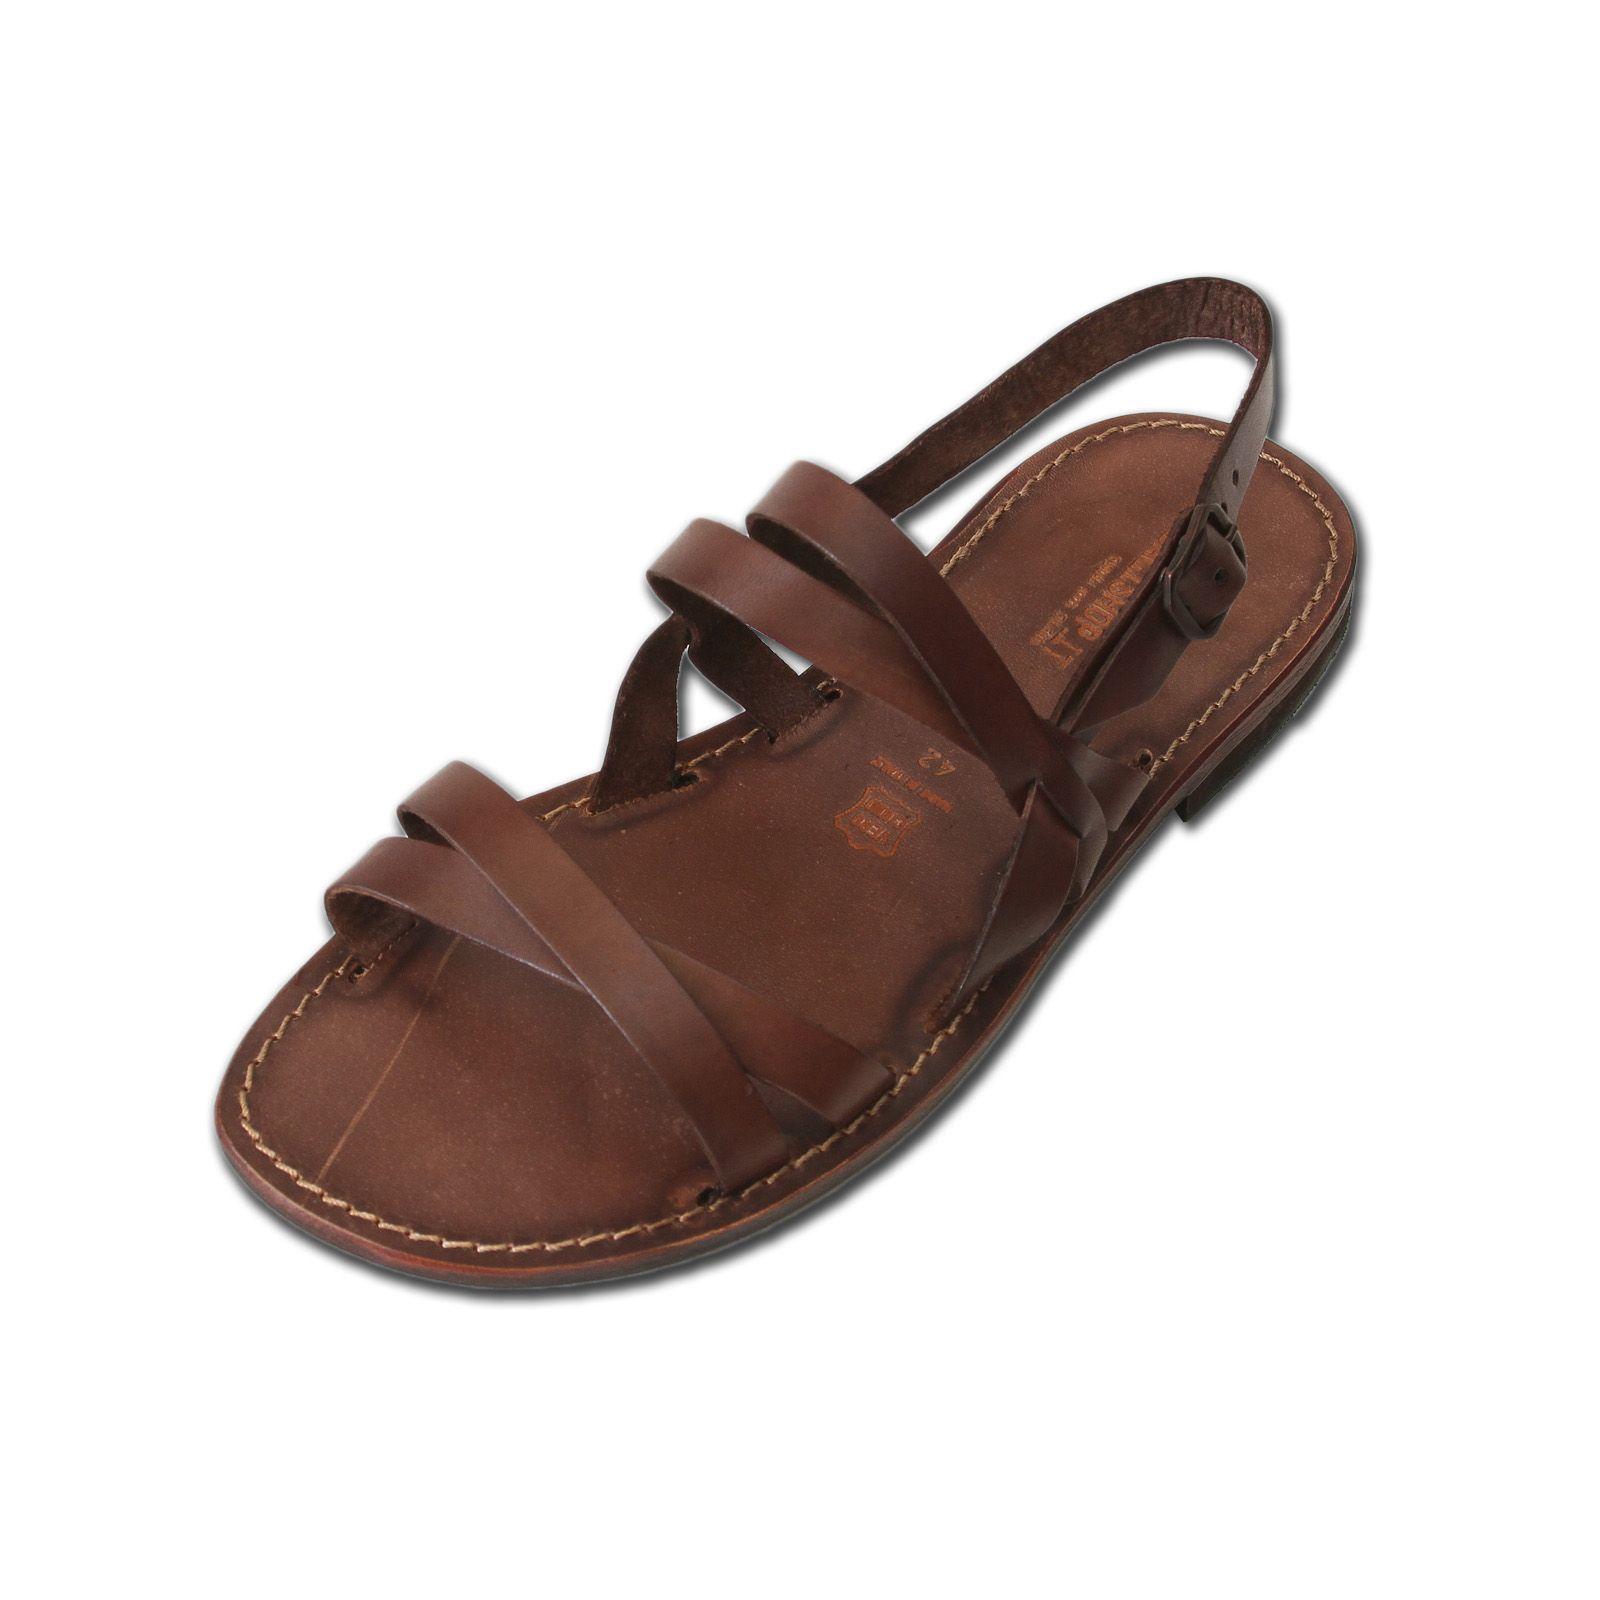 Pelle Line Shoes Online For Men